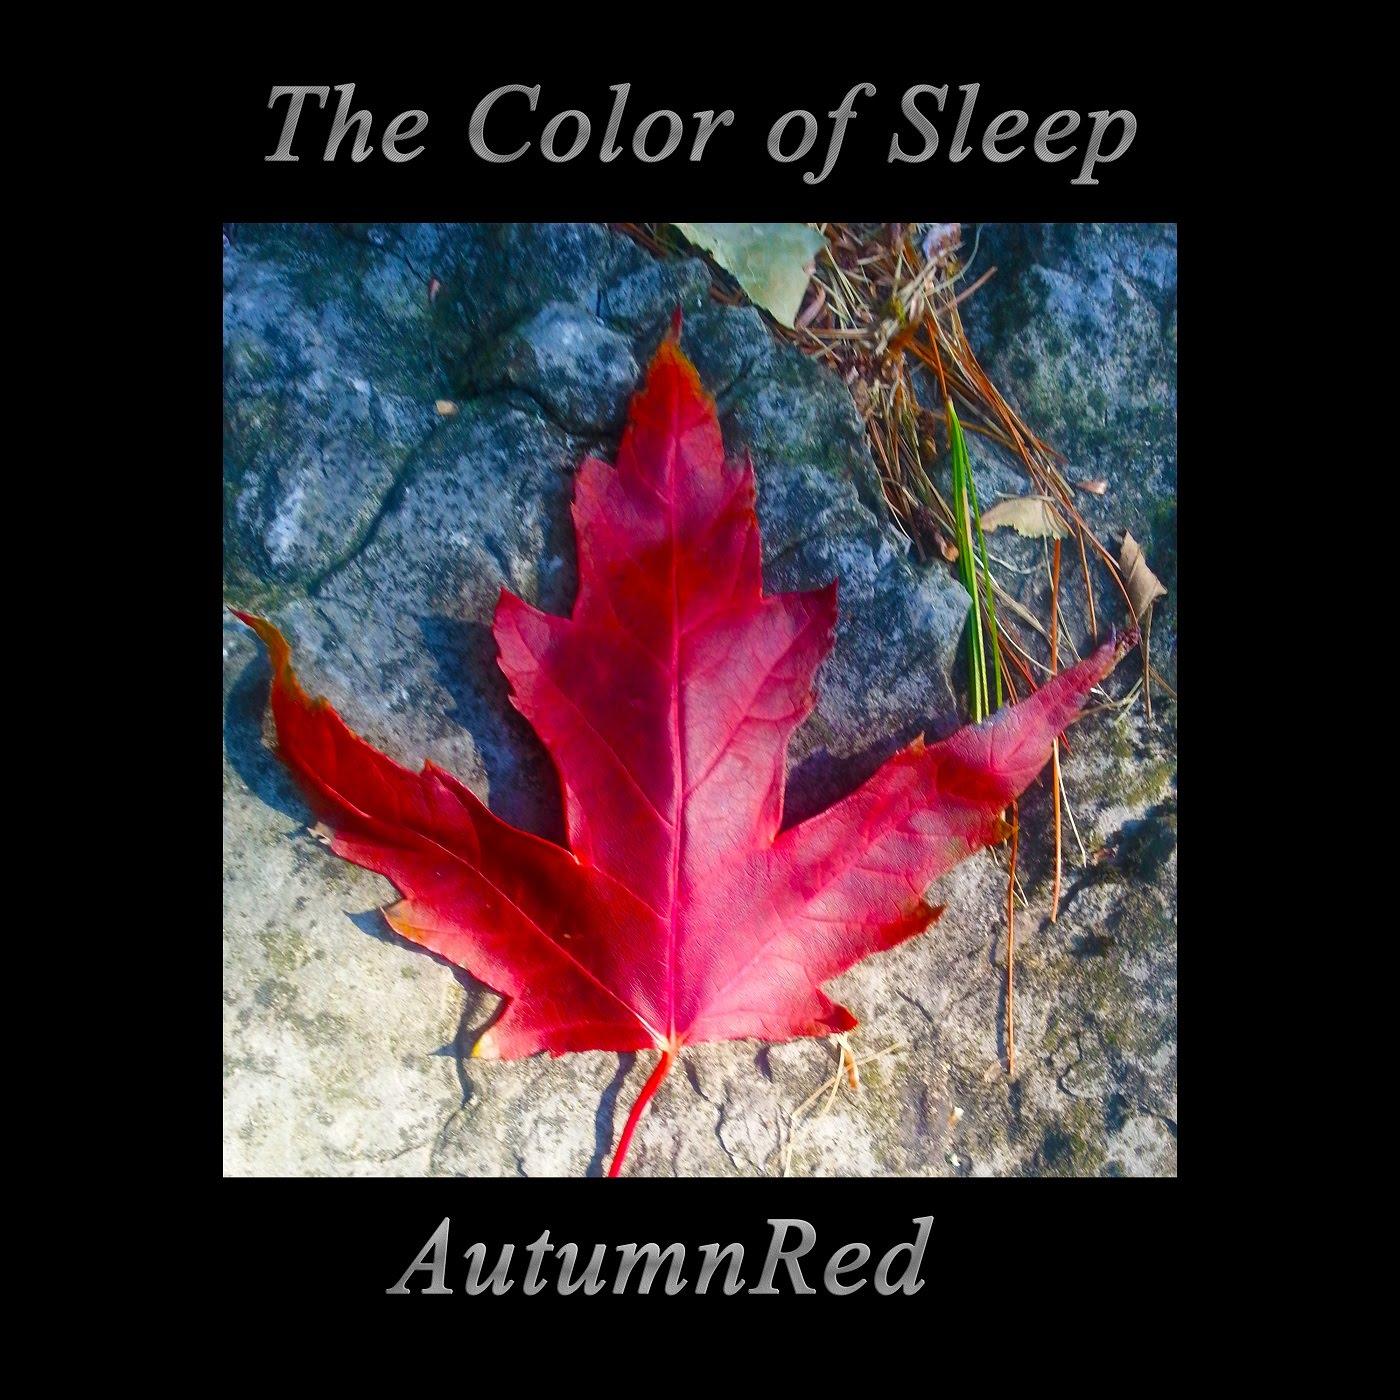 https://thecolorofsleep.bandcamp.com/album/autumnred